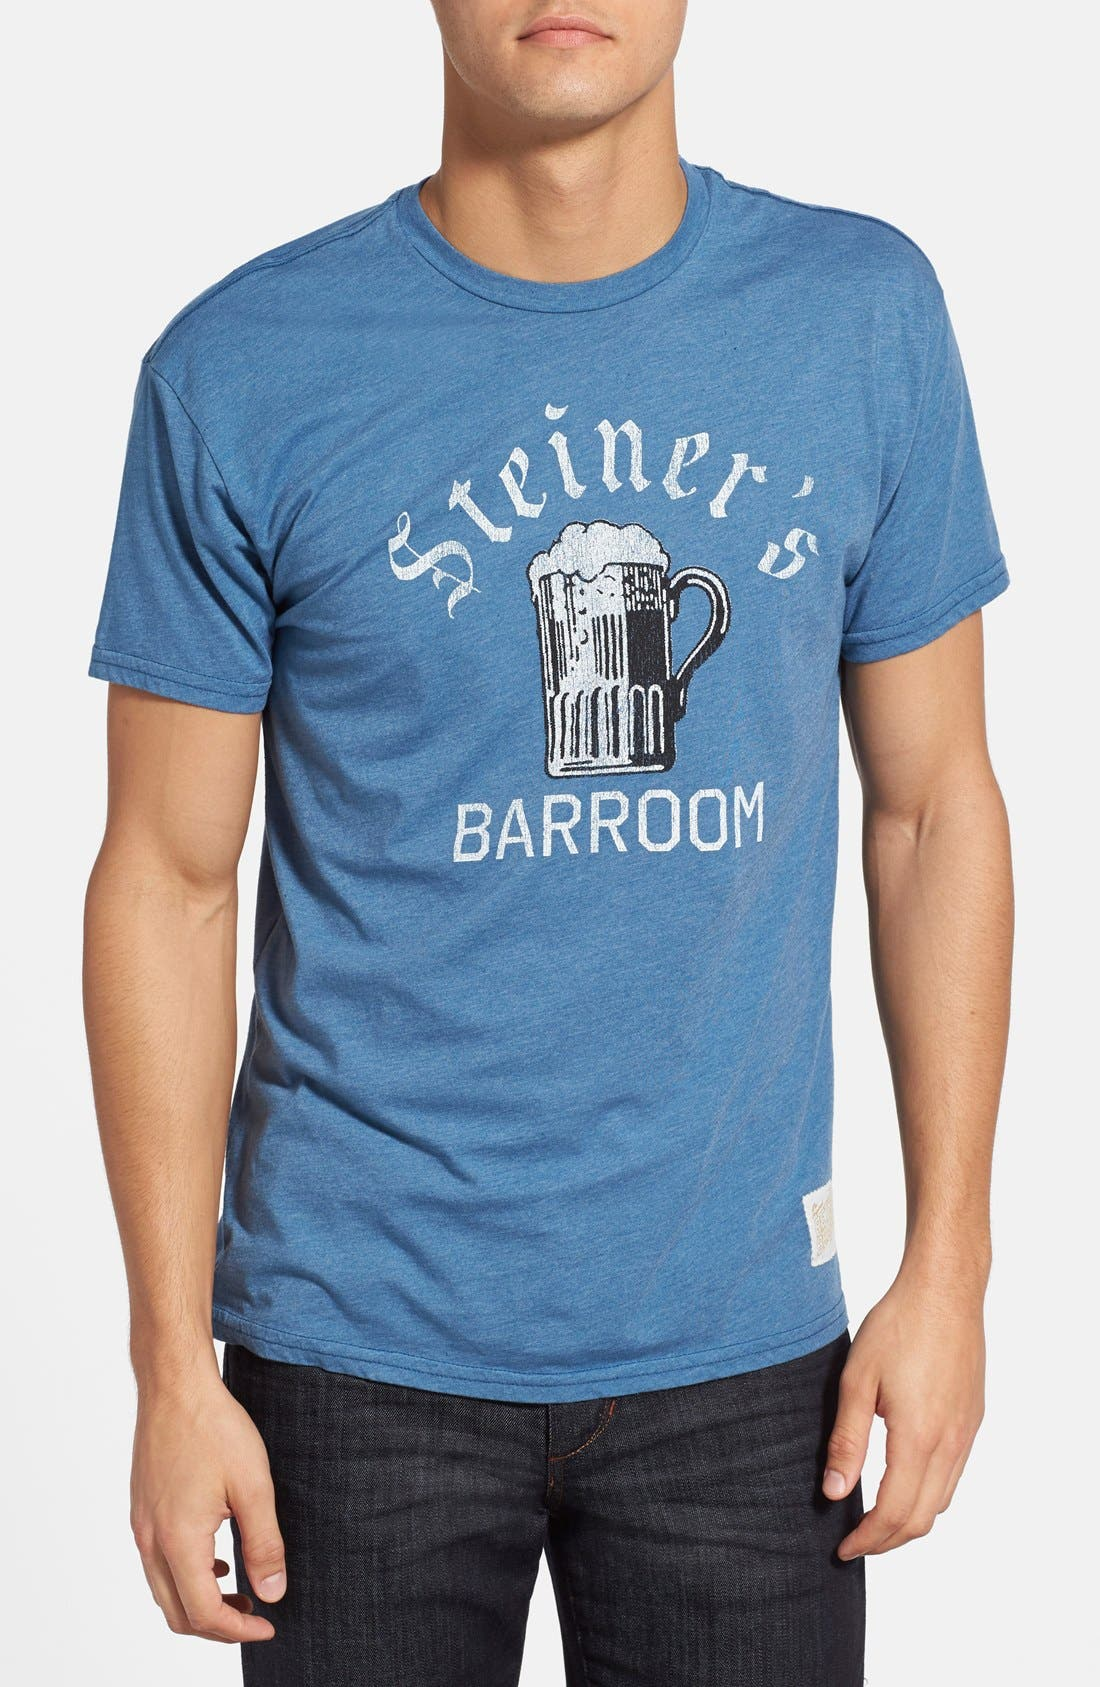 Main Image - Retro Brand 'Steiner's Bar Room' Slim Fit Graphic T-Shirt